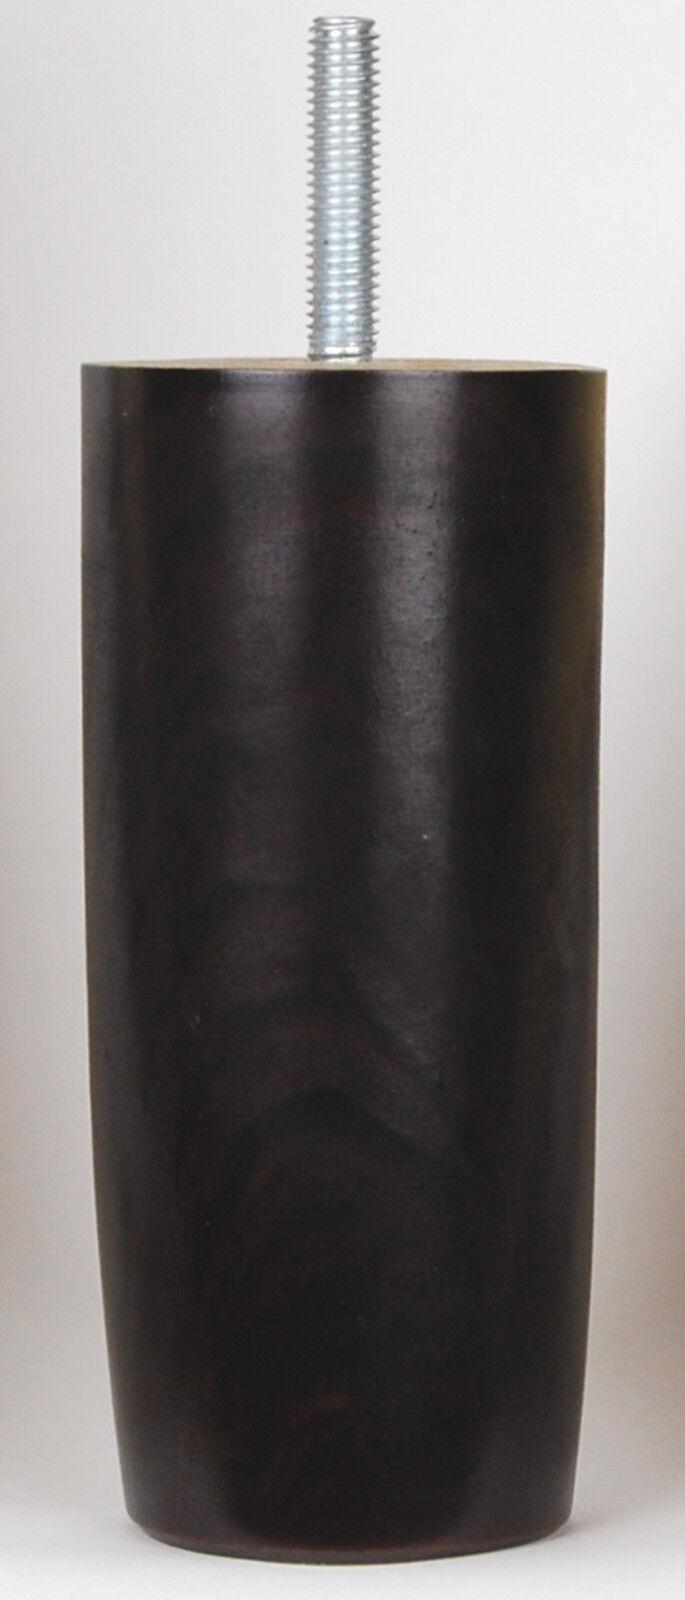 12 WOODEN FURNITURE LEGS  SOFA STOOL CHAIR BED  Edinburgh Woodturning E593-DDM